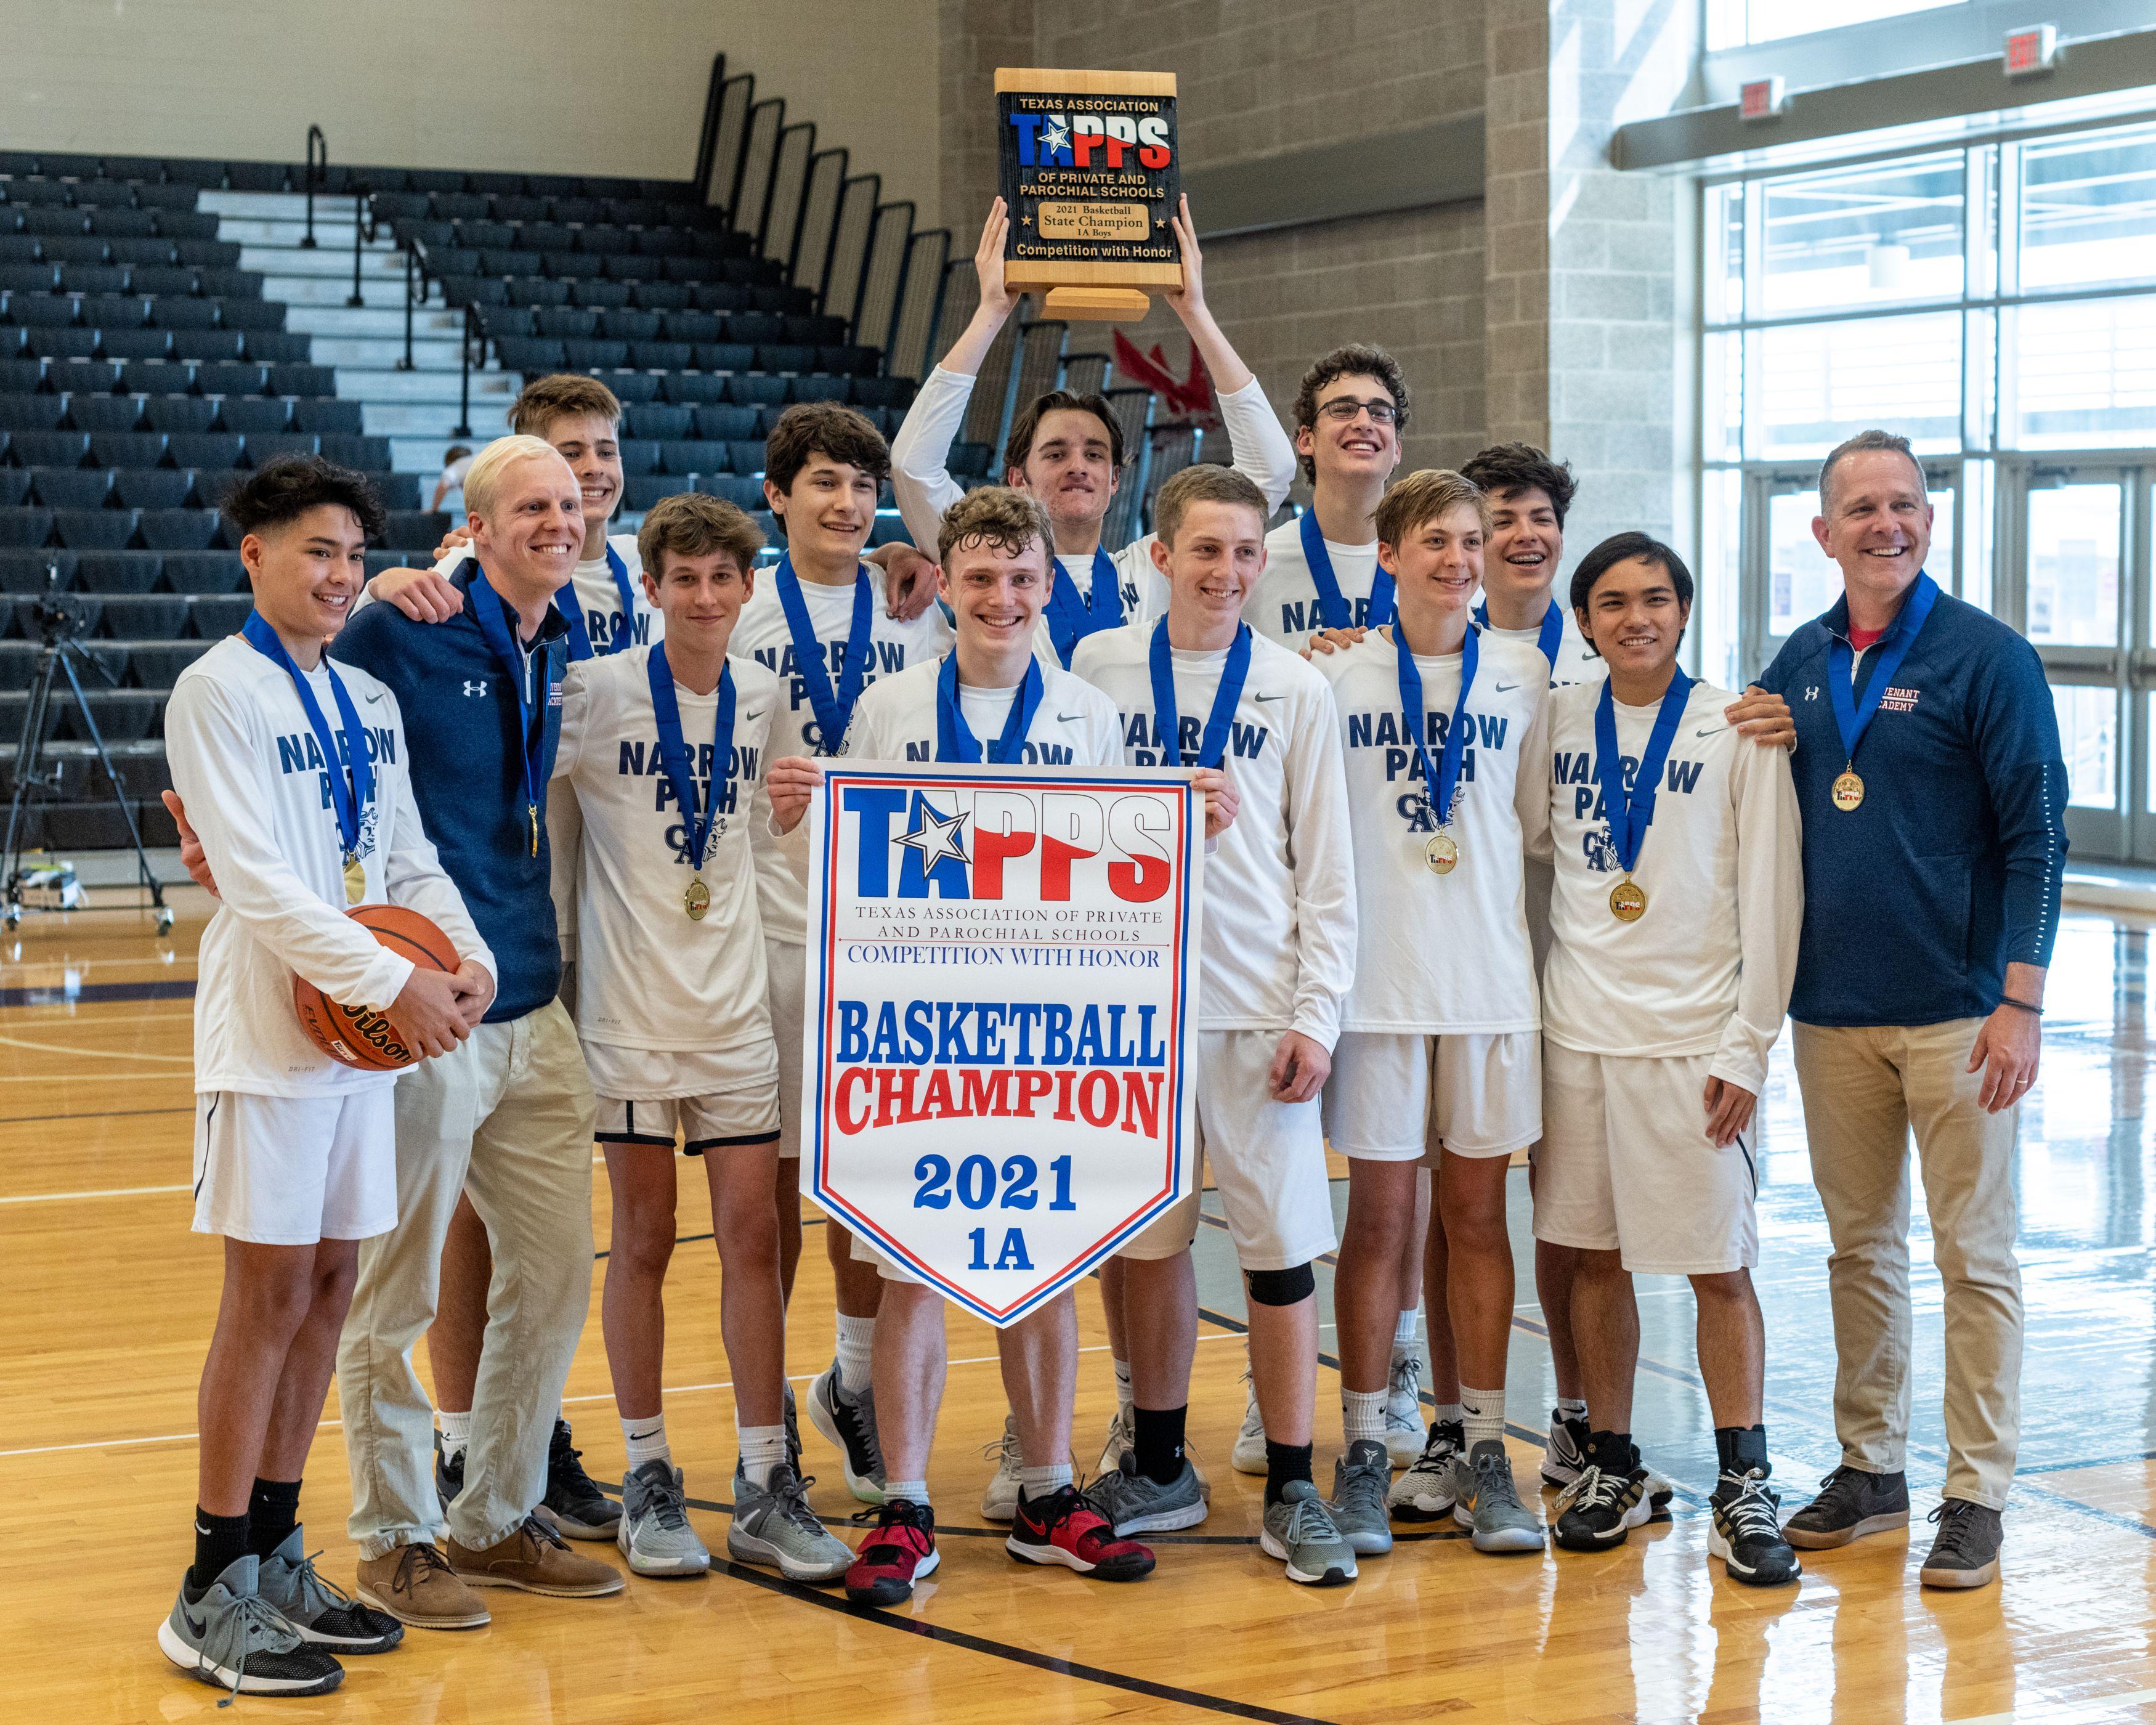 2021 High School Boys Basketball Team